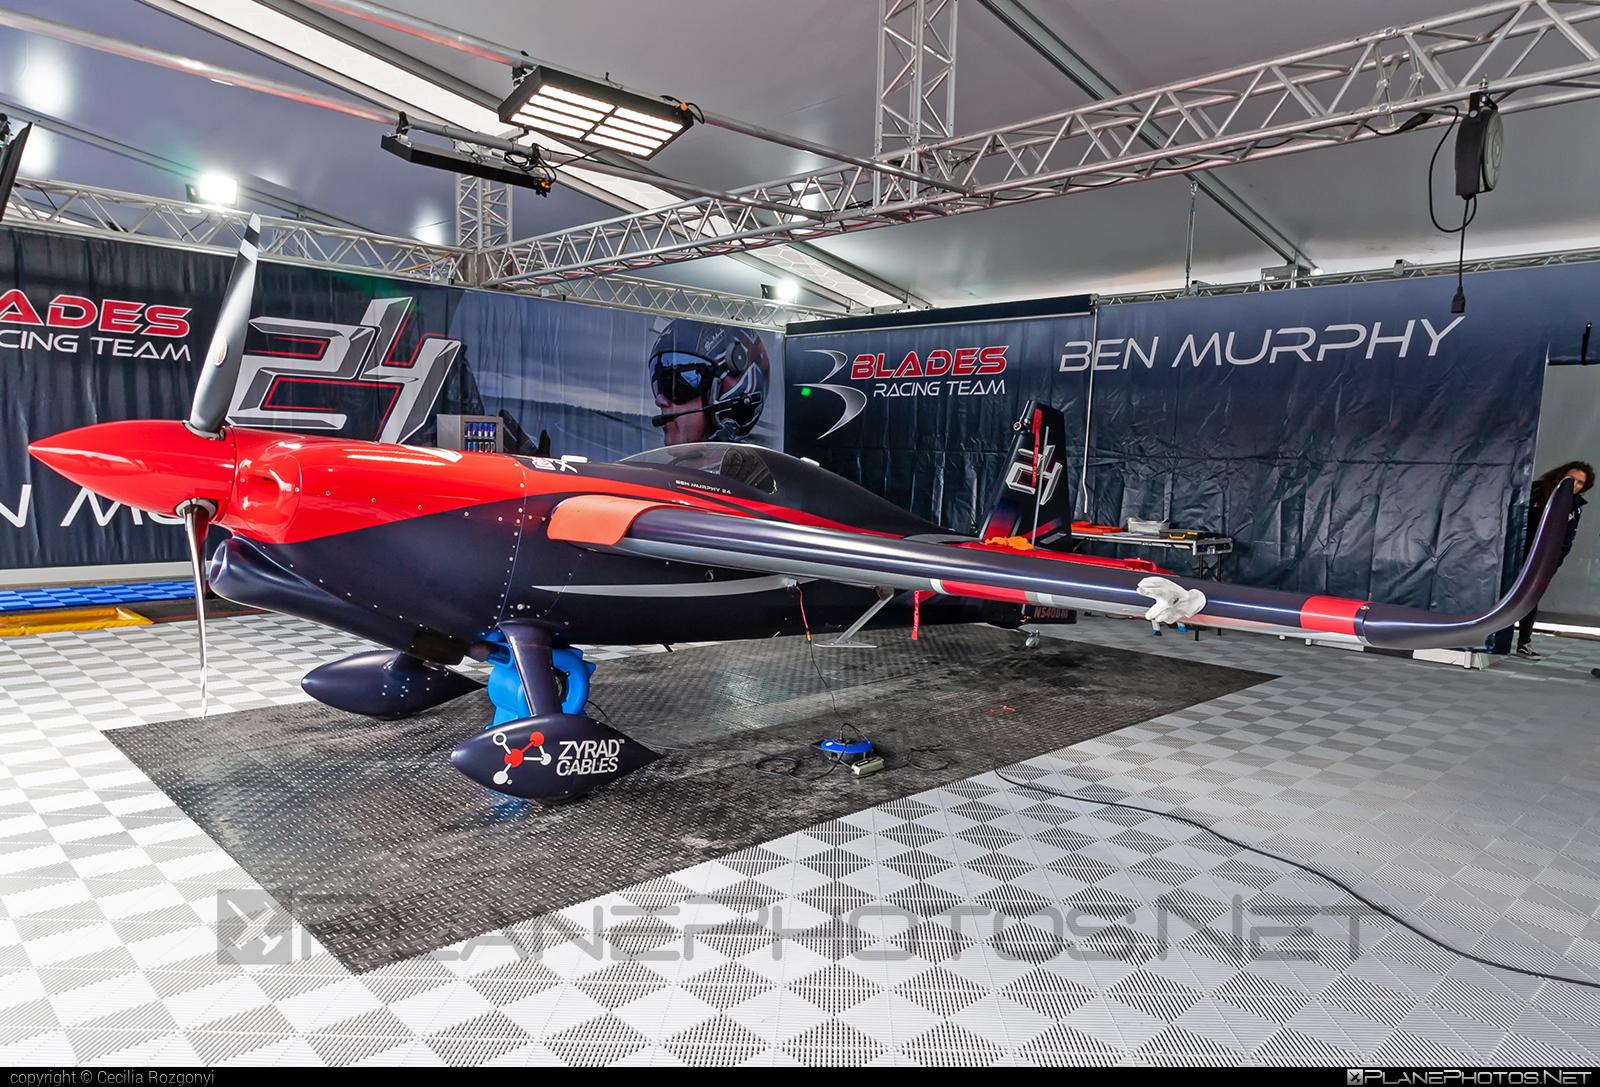 Zivko Edge 540V2 - N540BM operated by Private operator #benmurphy #edge540 #edge540v2 #redbullairrace #redbullairracebalaton #zivko #zivkoedge #zivkoedge540 #zivkoedge540v2